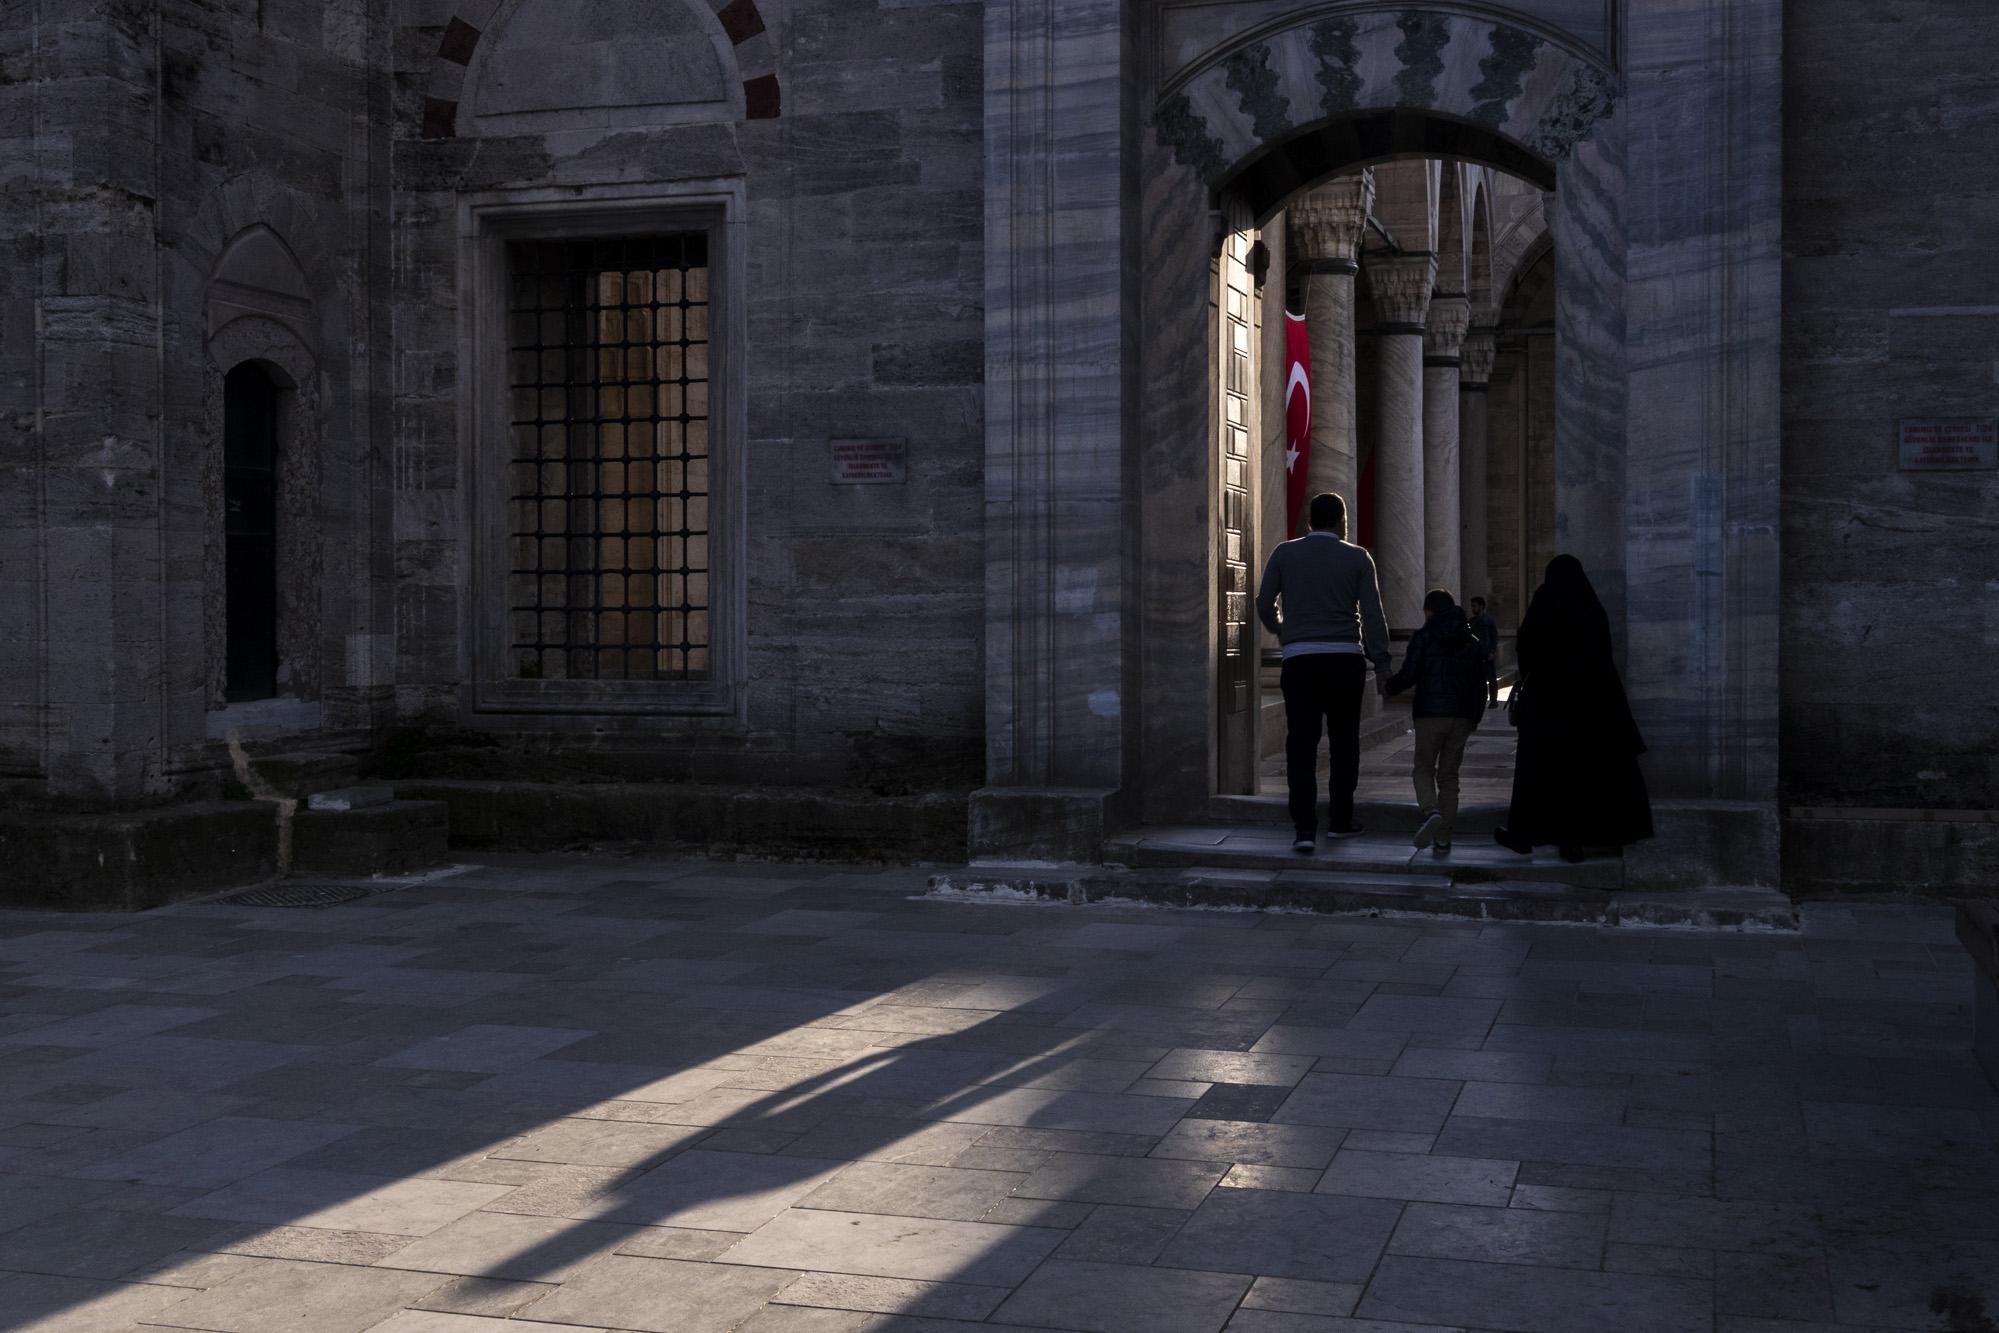 Yavuz Selim Camii dans la ville d'İstanbul en Turquie